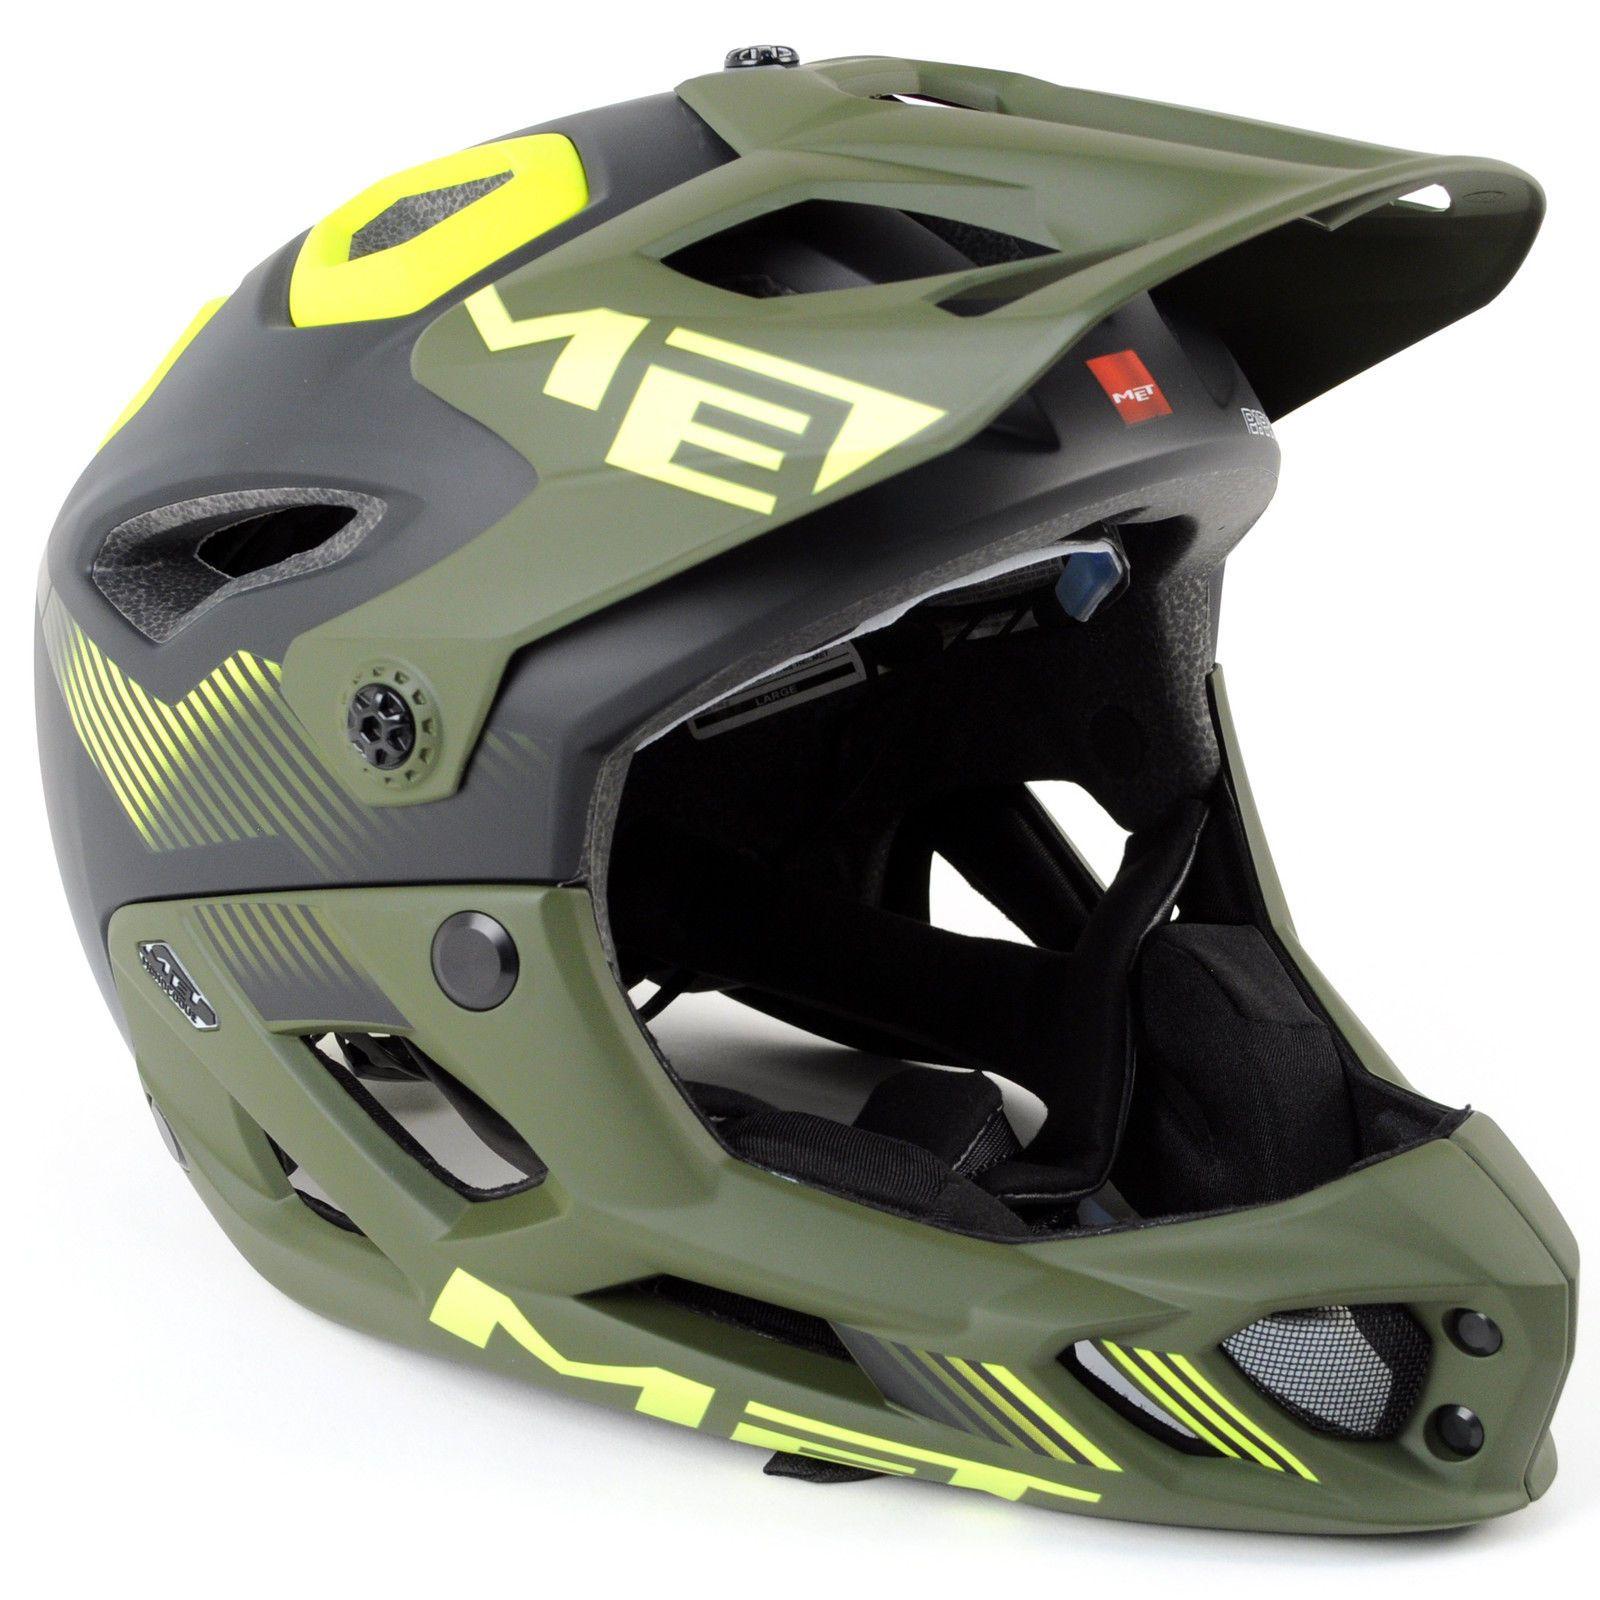 70ece5012 MET Parachute MTB Full Face Helmet    Matte Black Green Safety Yellow     Large